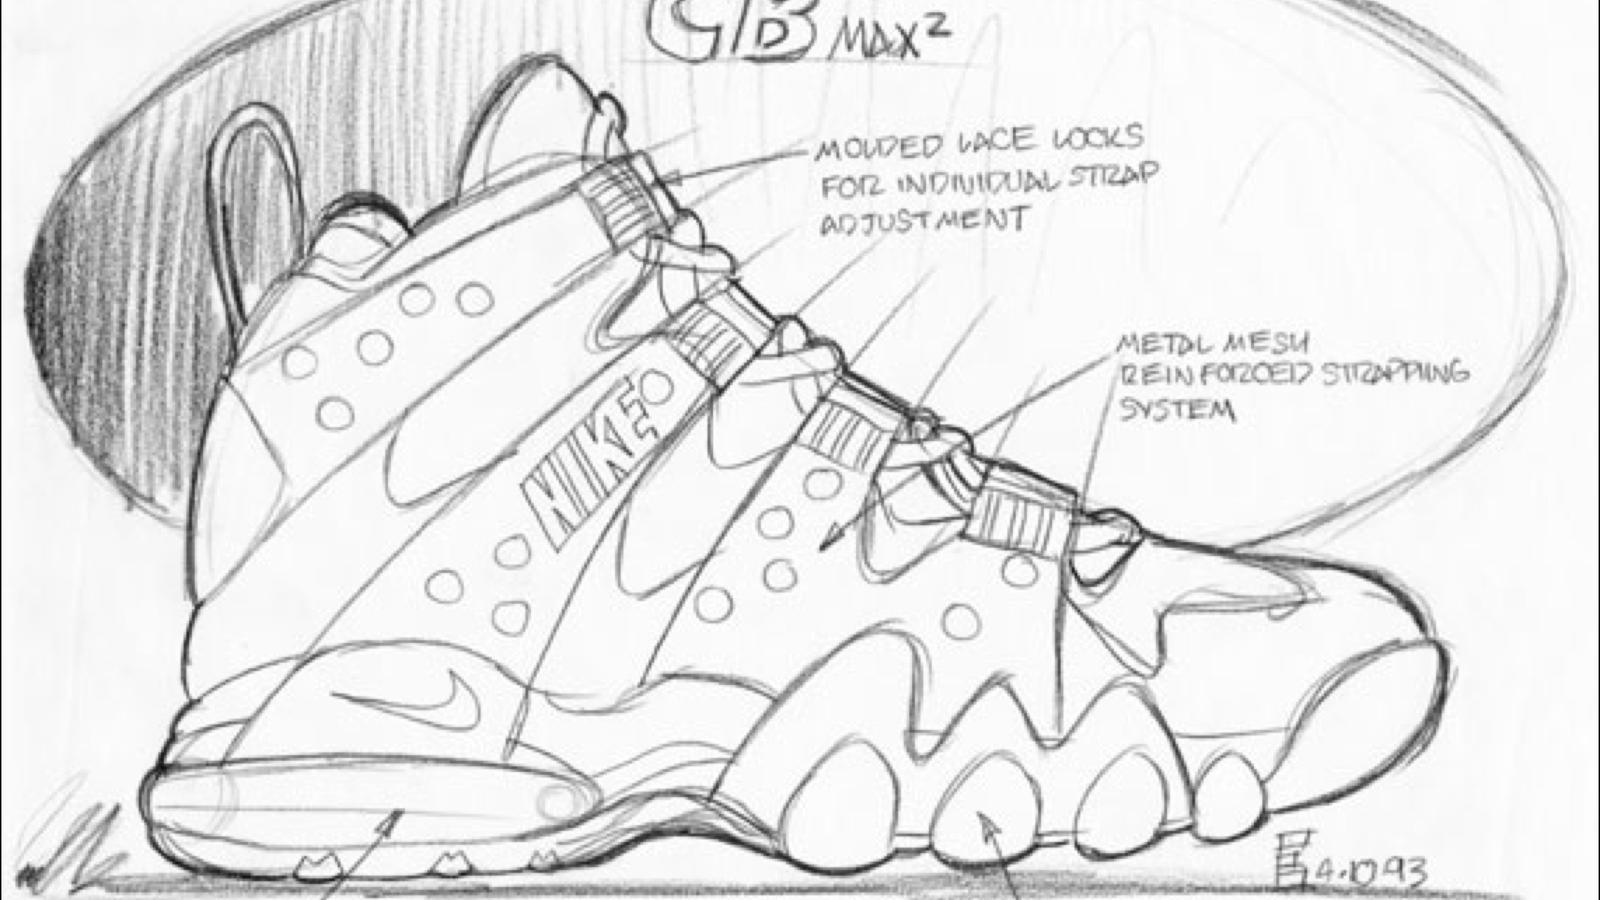 20-years-nike-bball-air-max2-cb-16